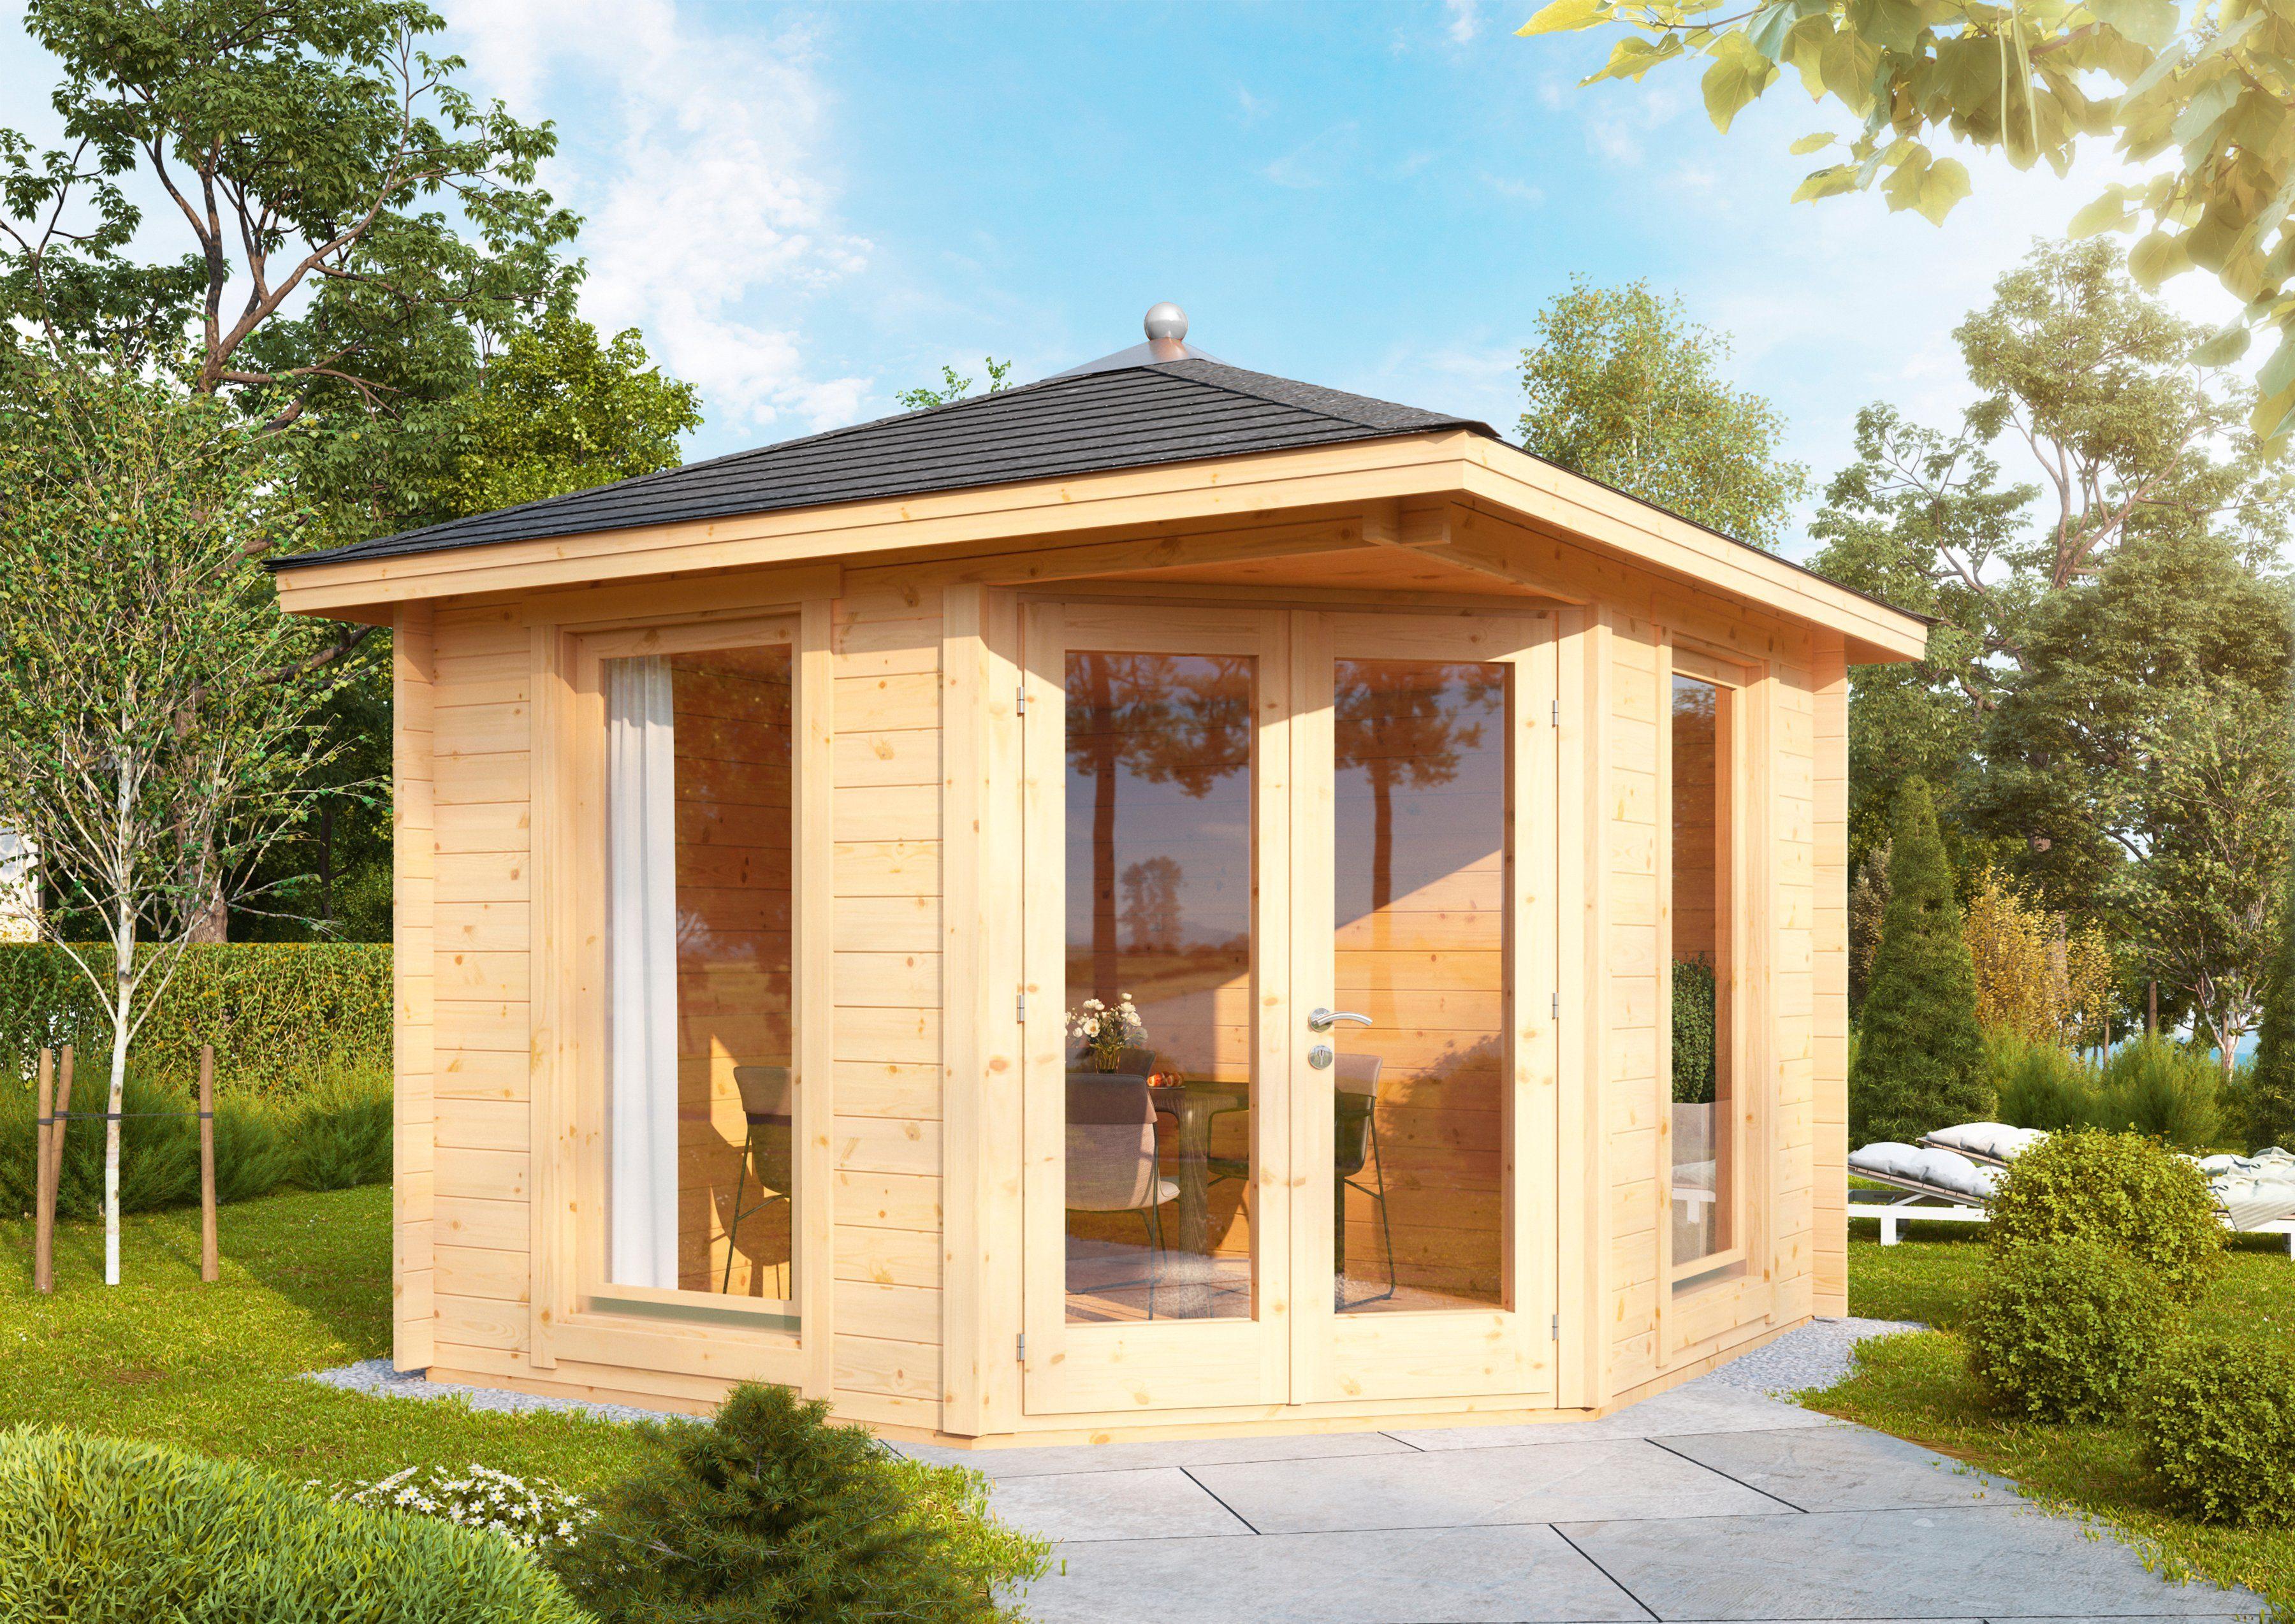 WOLFF Set: Gartenhaus »Katrin 44-A«, BxT: 352x352 cm, Fußboden, schwarze Schindeln, Dachhaube